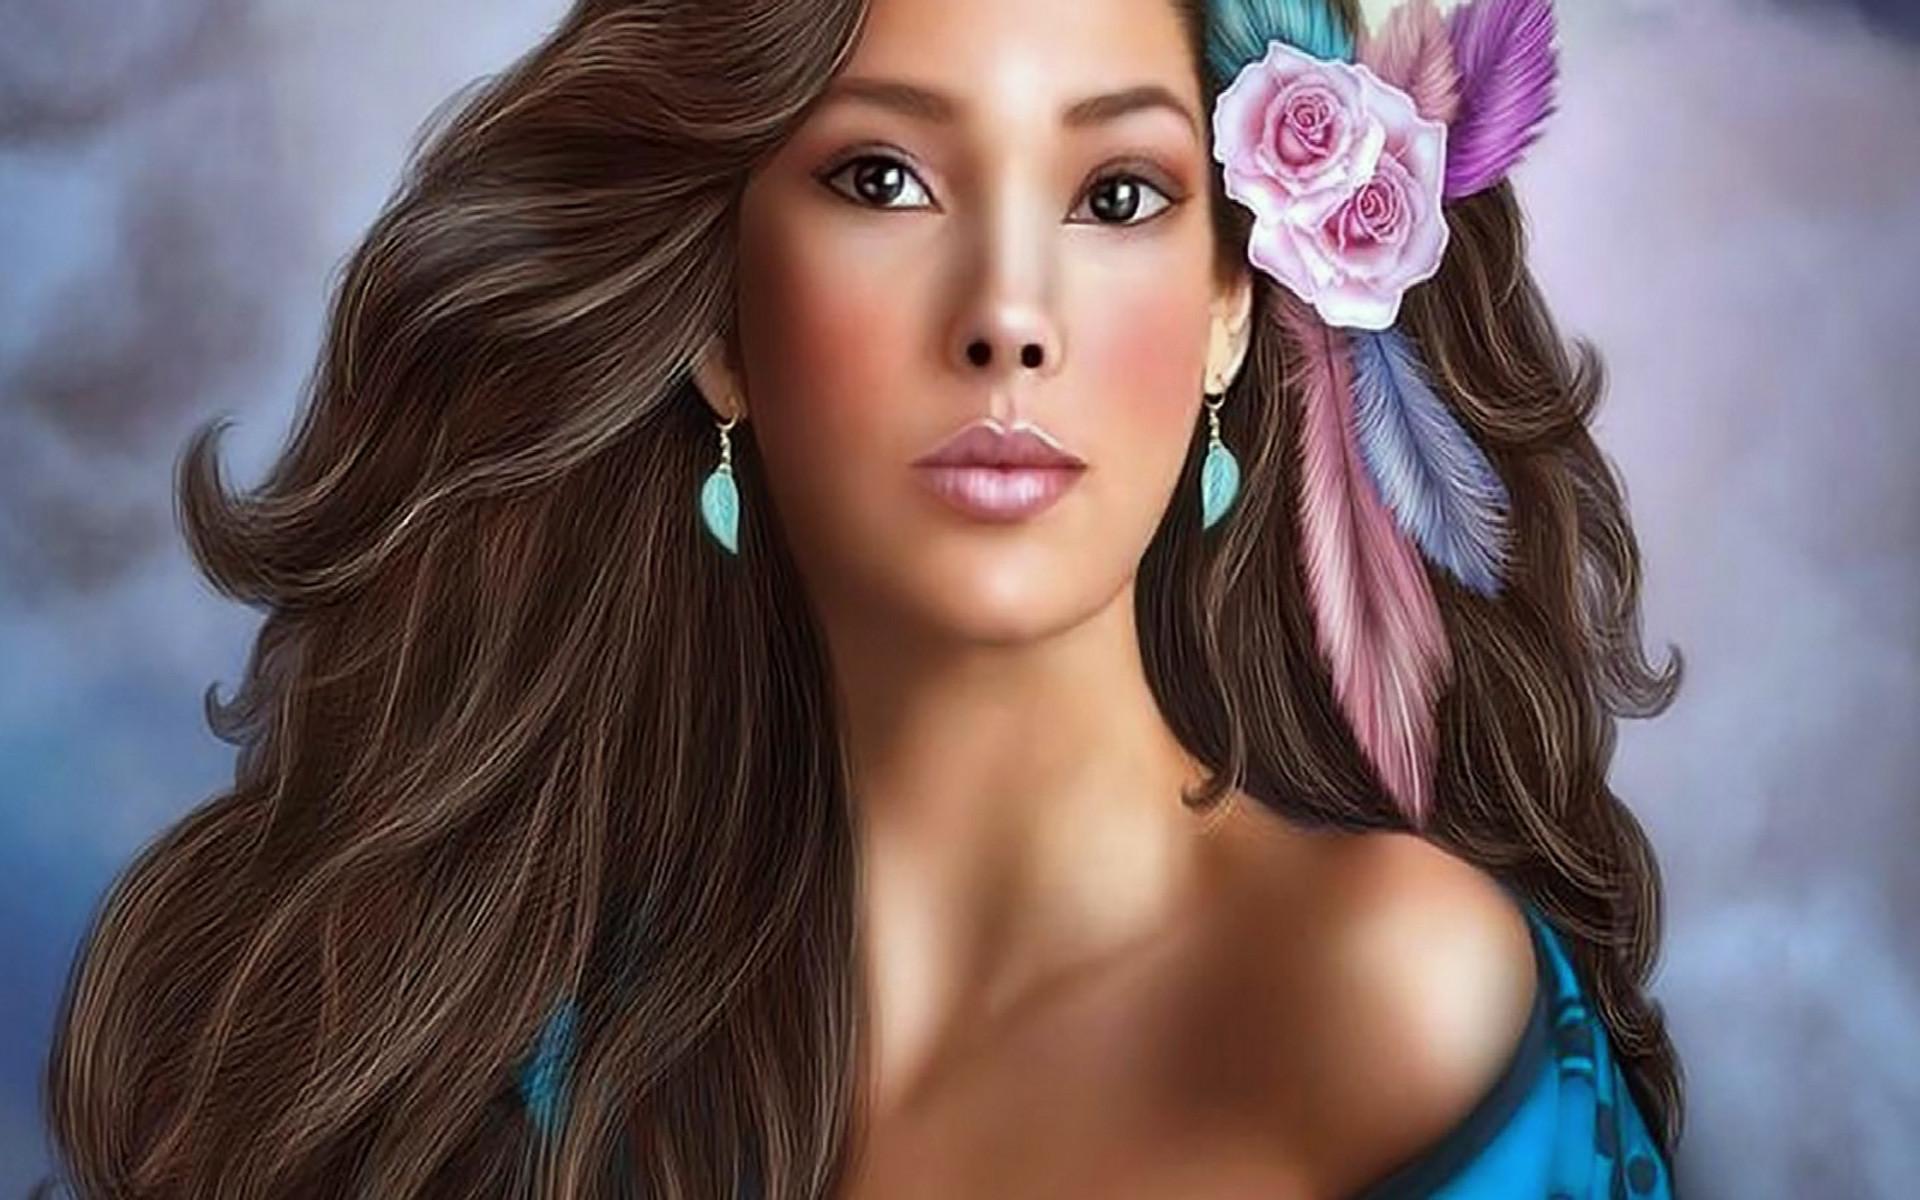 beautiful girls wallpapers full hd free download HD Wallpapers